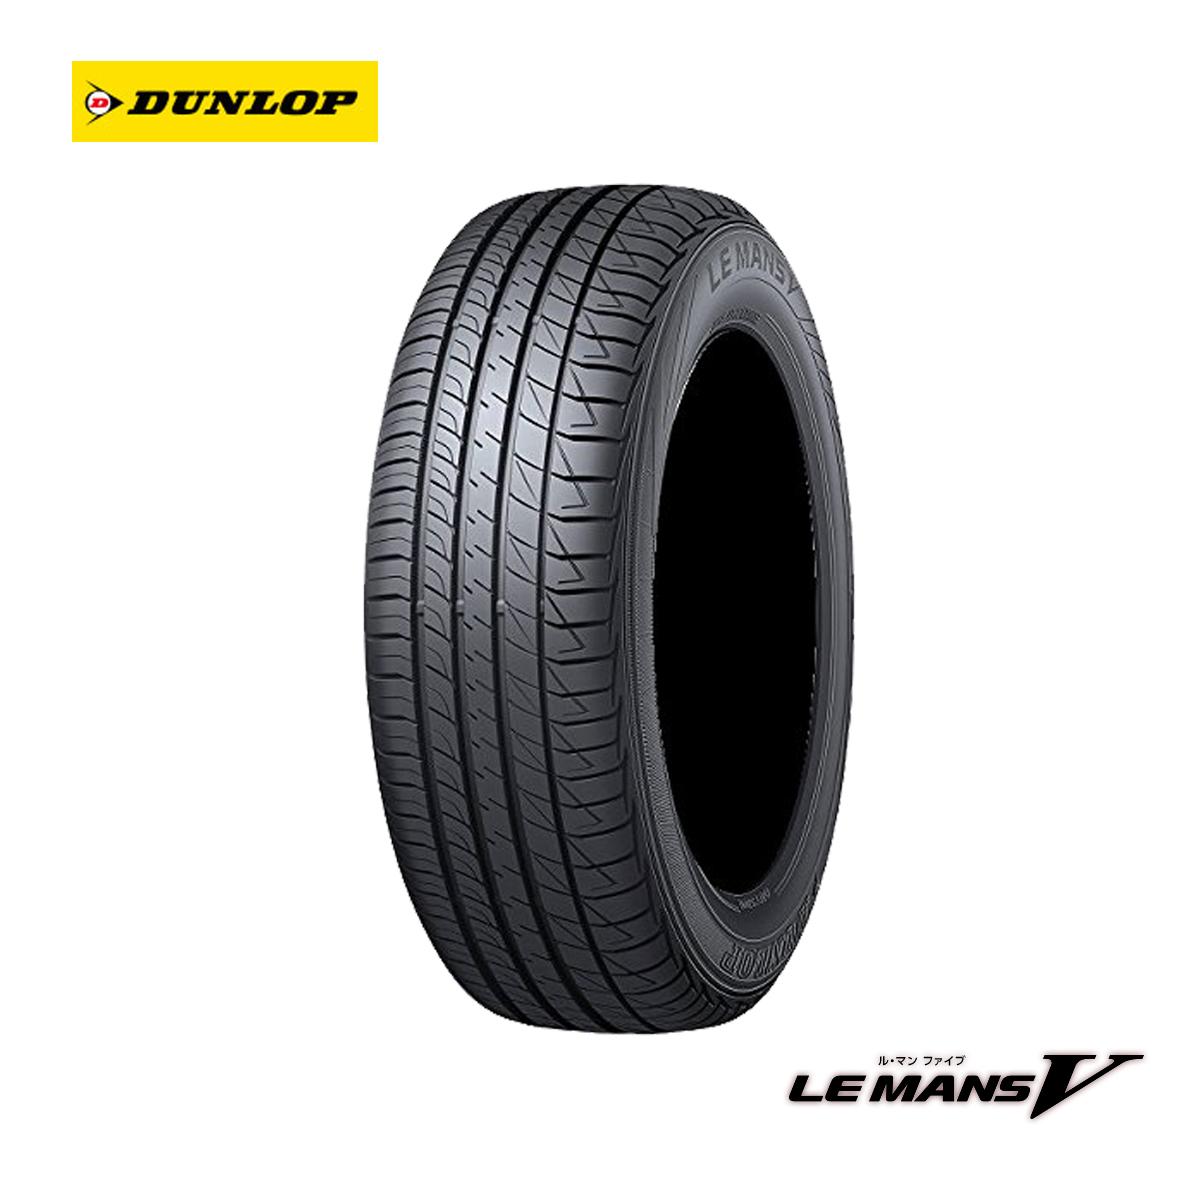 DUNLOP ダンロップ ルマン 低燃費 サマータイヤ 4本 セット 17インチ 195/45R17 LEMANS V ル・マン ファイブ